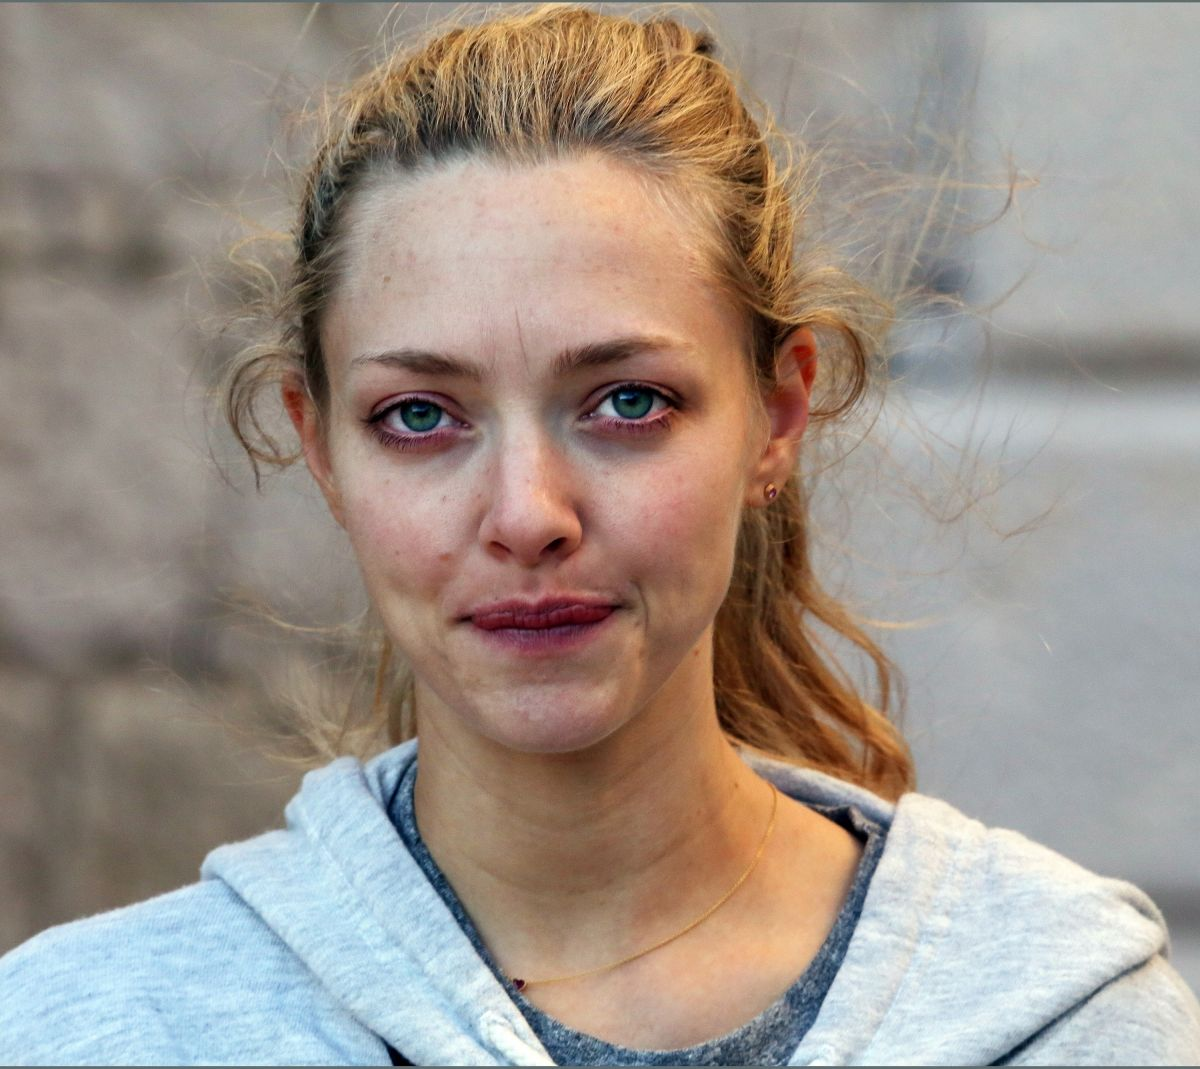 AMANDA SEYFRIED Makeup Free Out in Croatia 09/21/2017 ... Amanda Seyfried